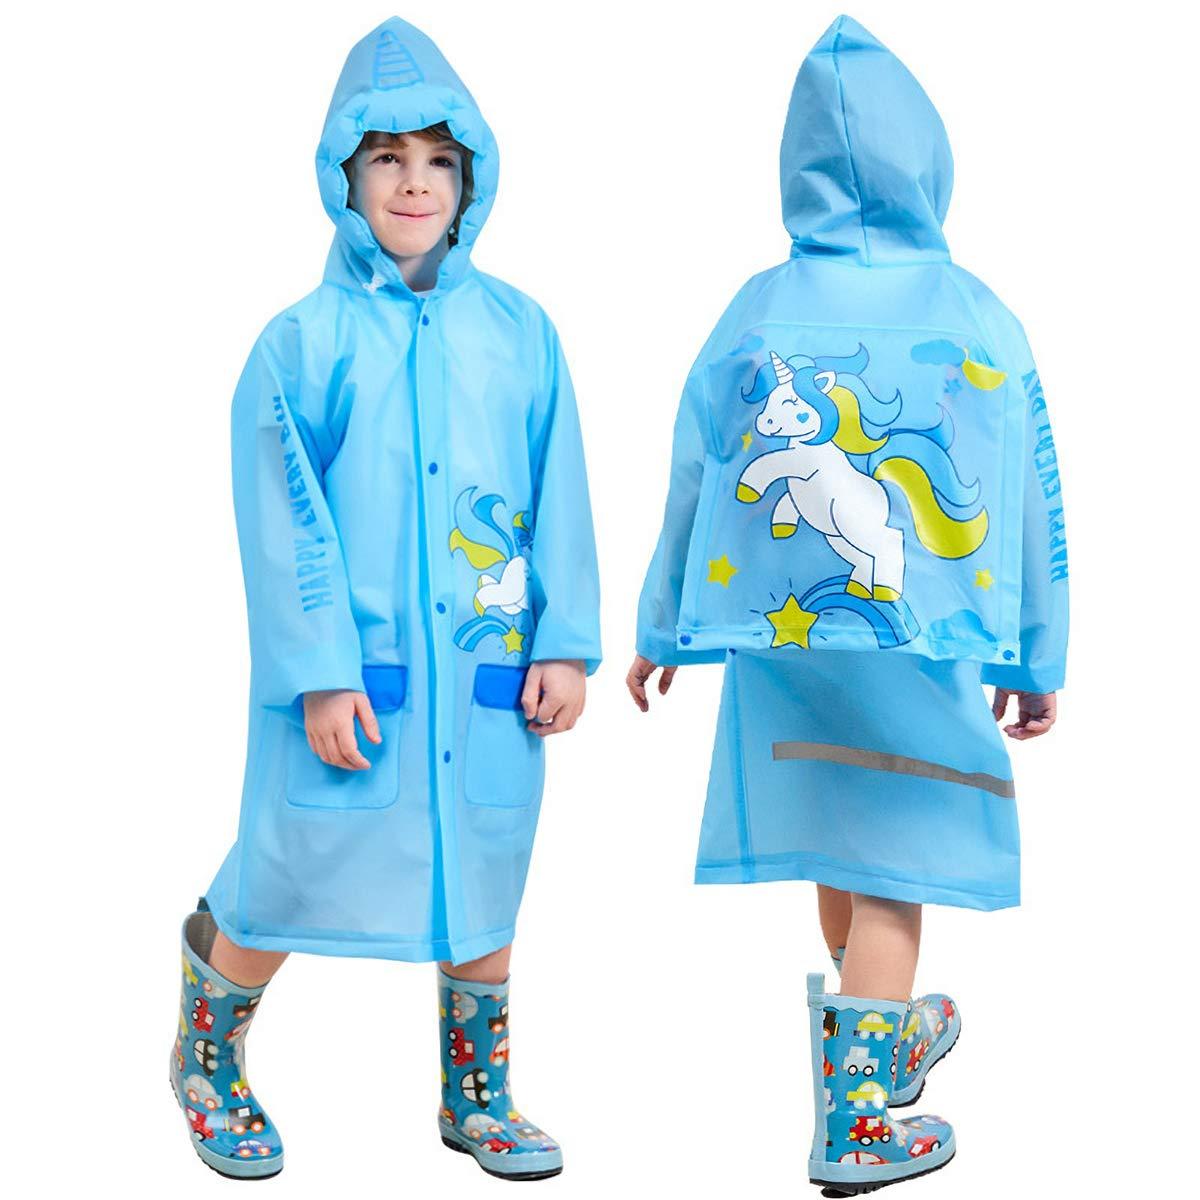 Slyfairy Kids Unicorn Raincoat Girls Boys Reusable Hooded Rainwear Cover Rain Jacket